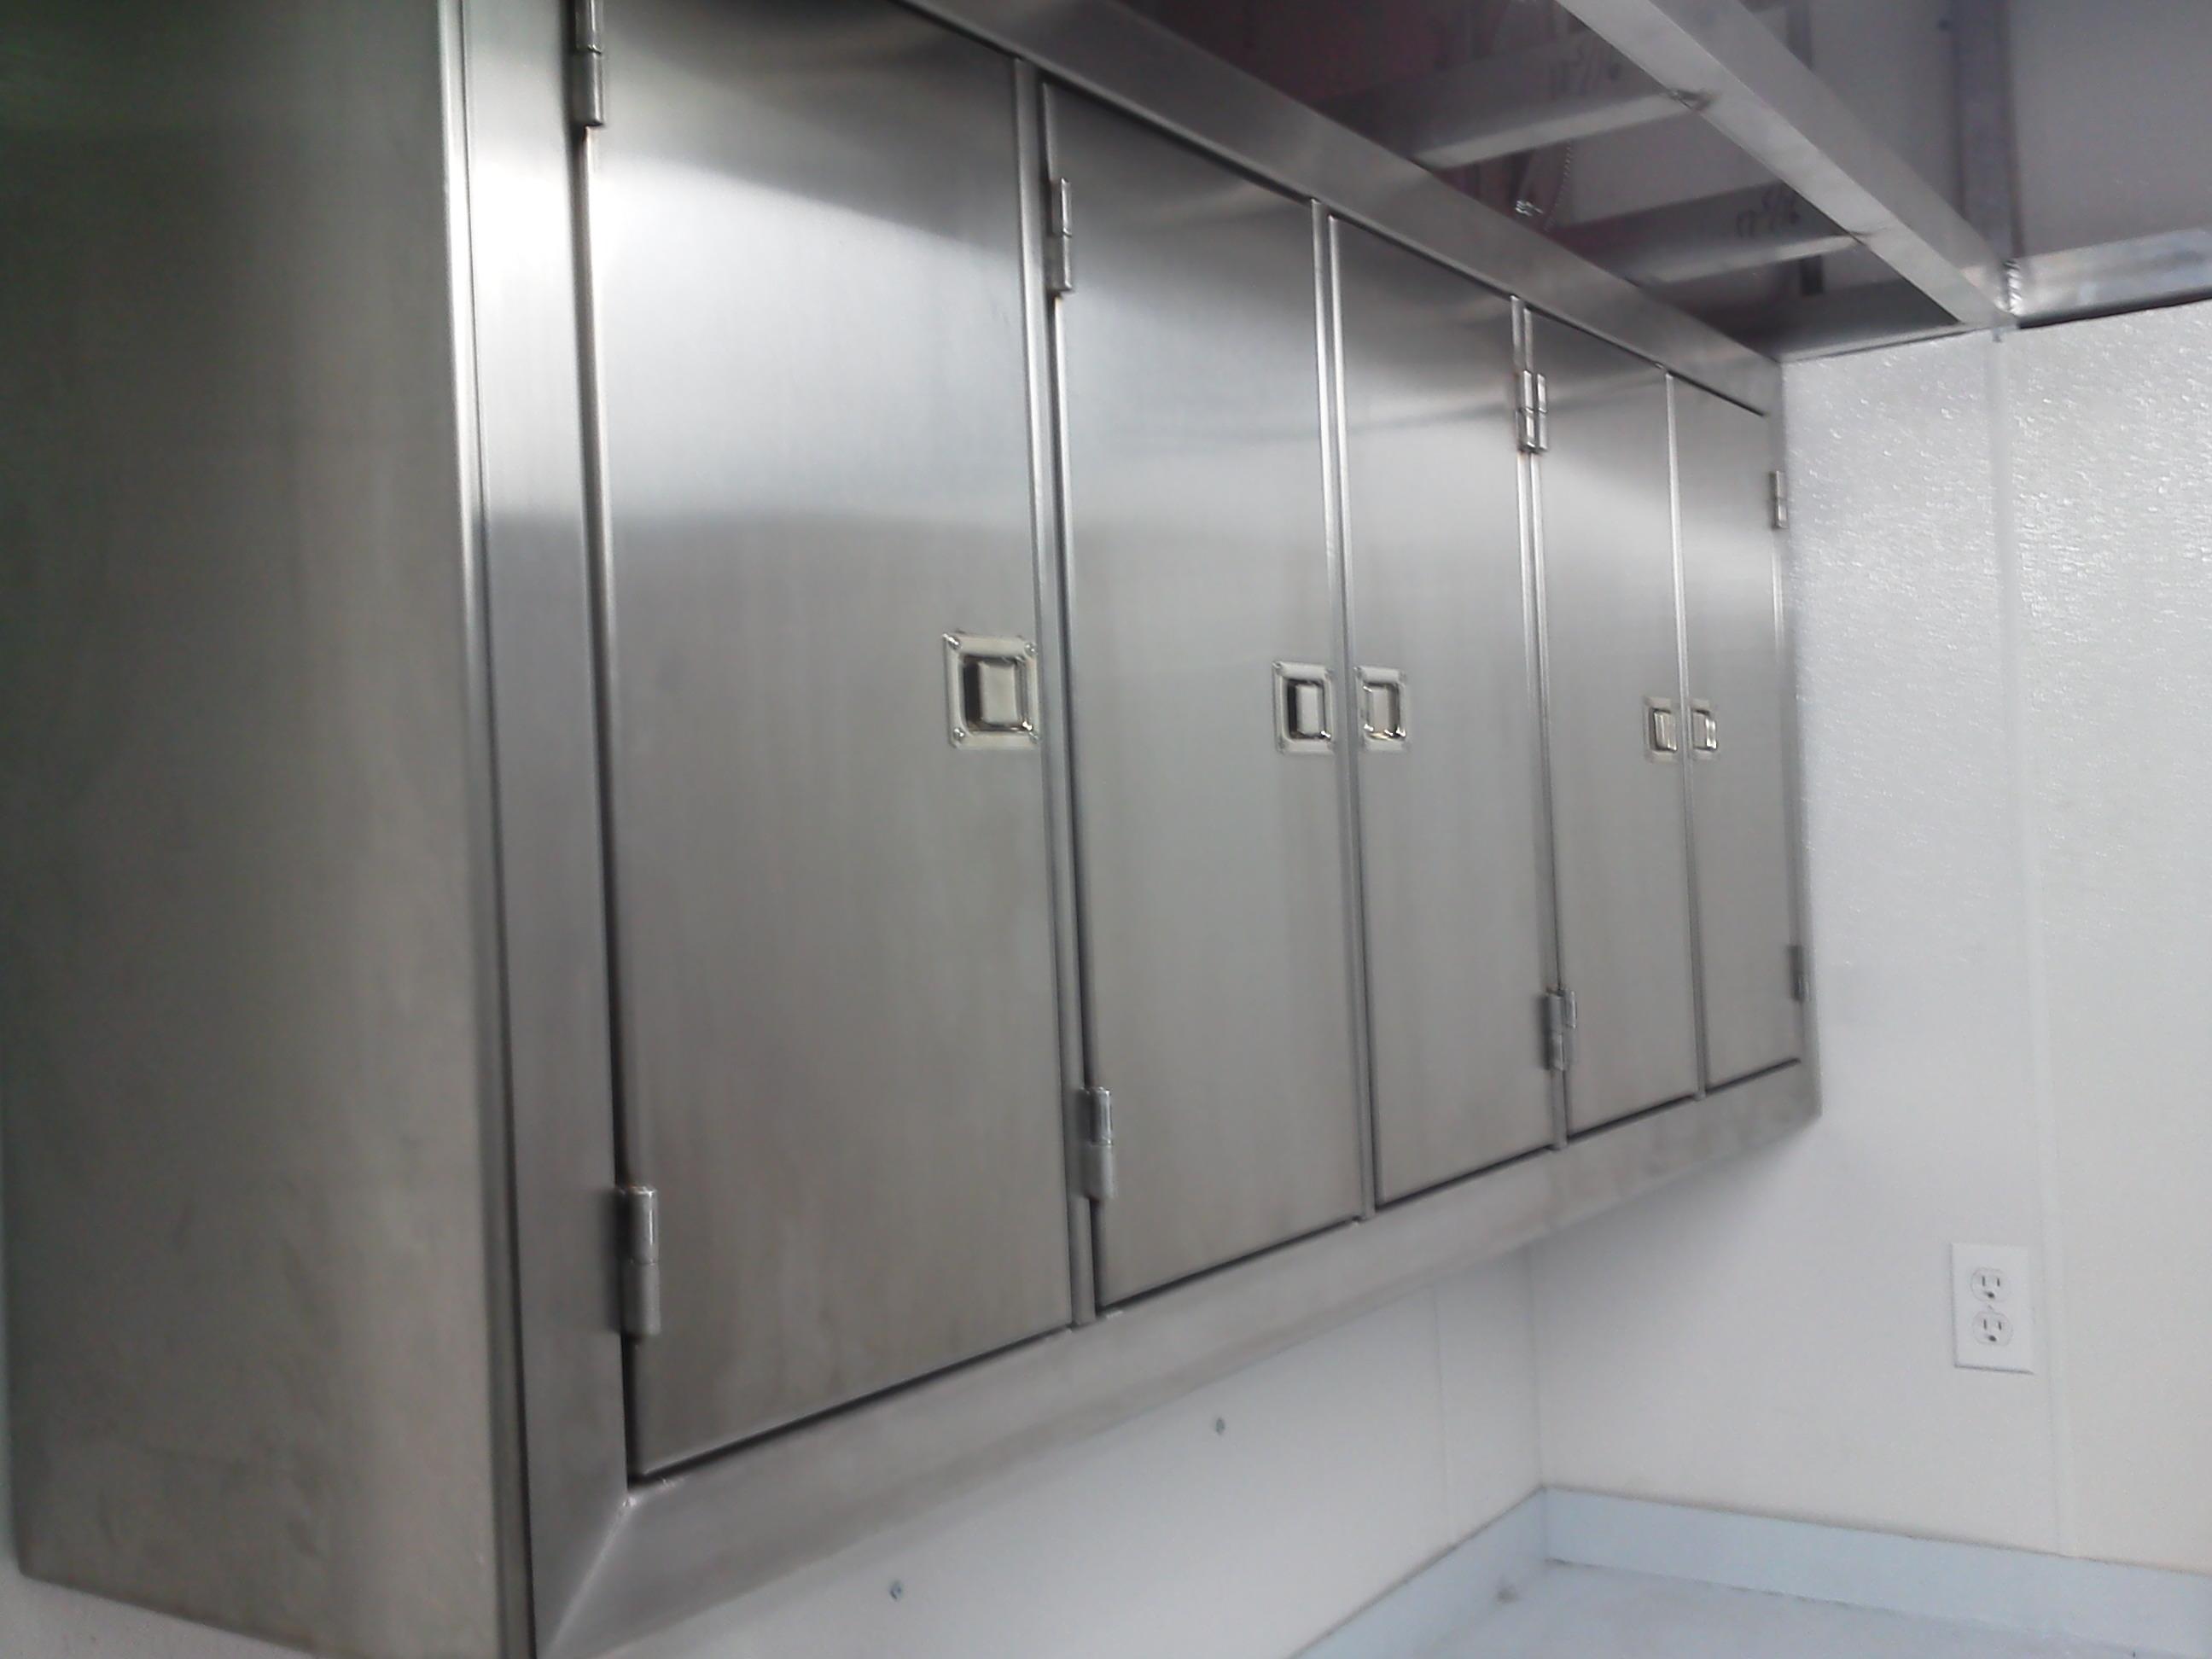 Fullsize Of Stainless Steel Cabinets